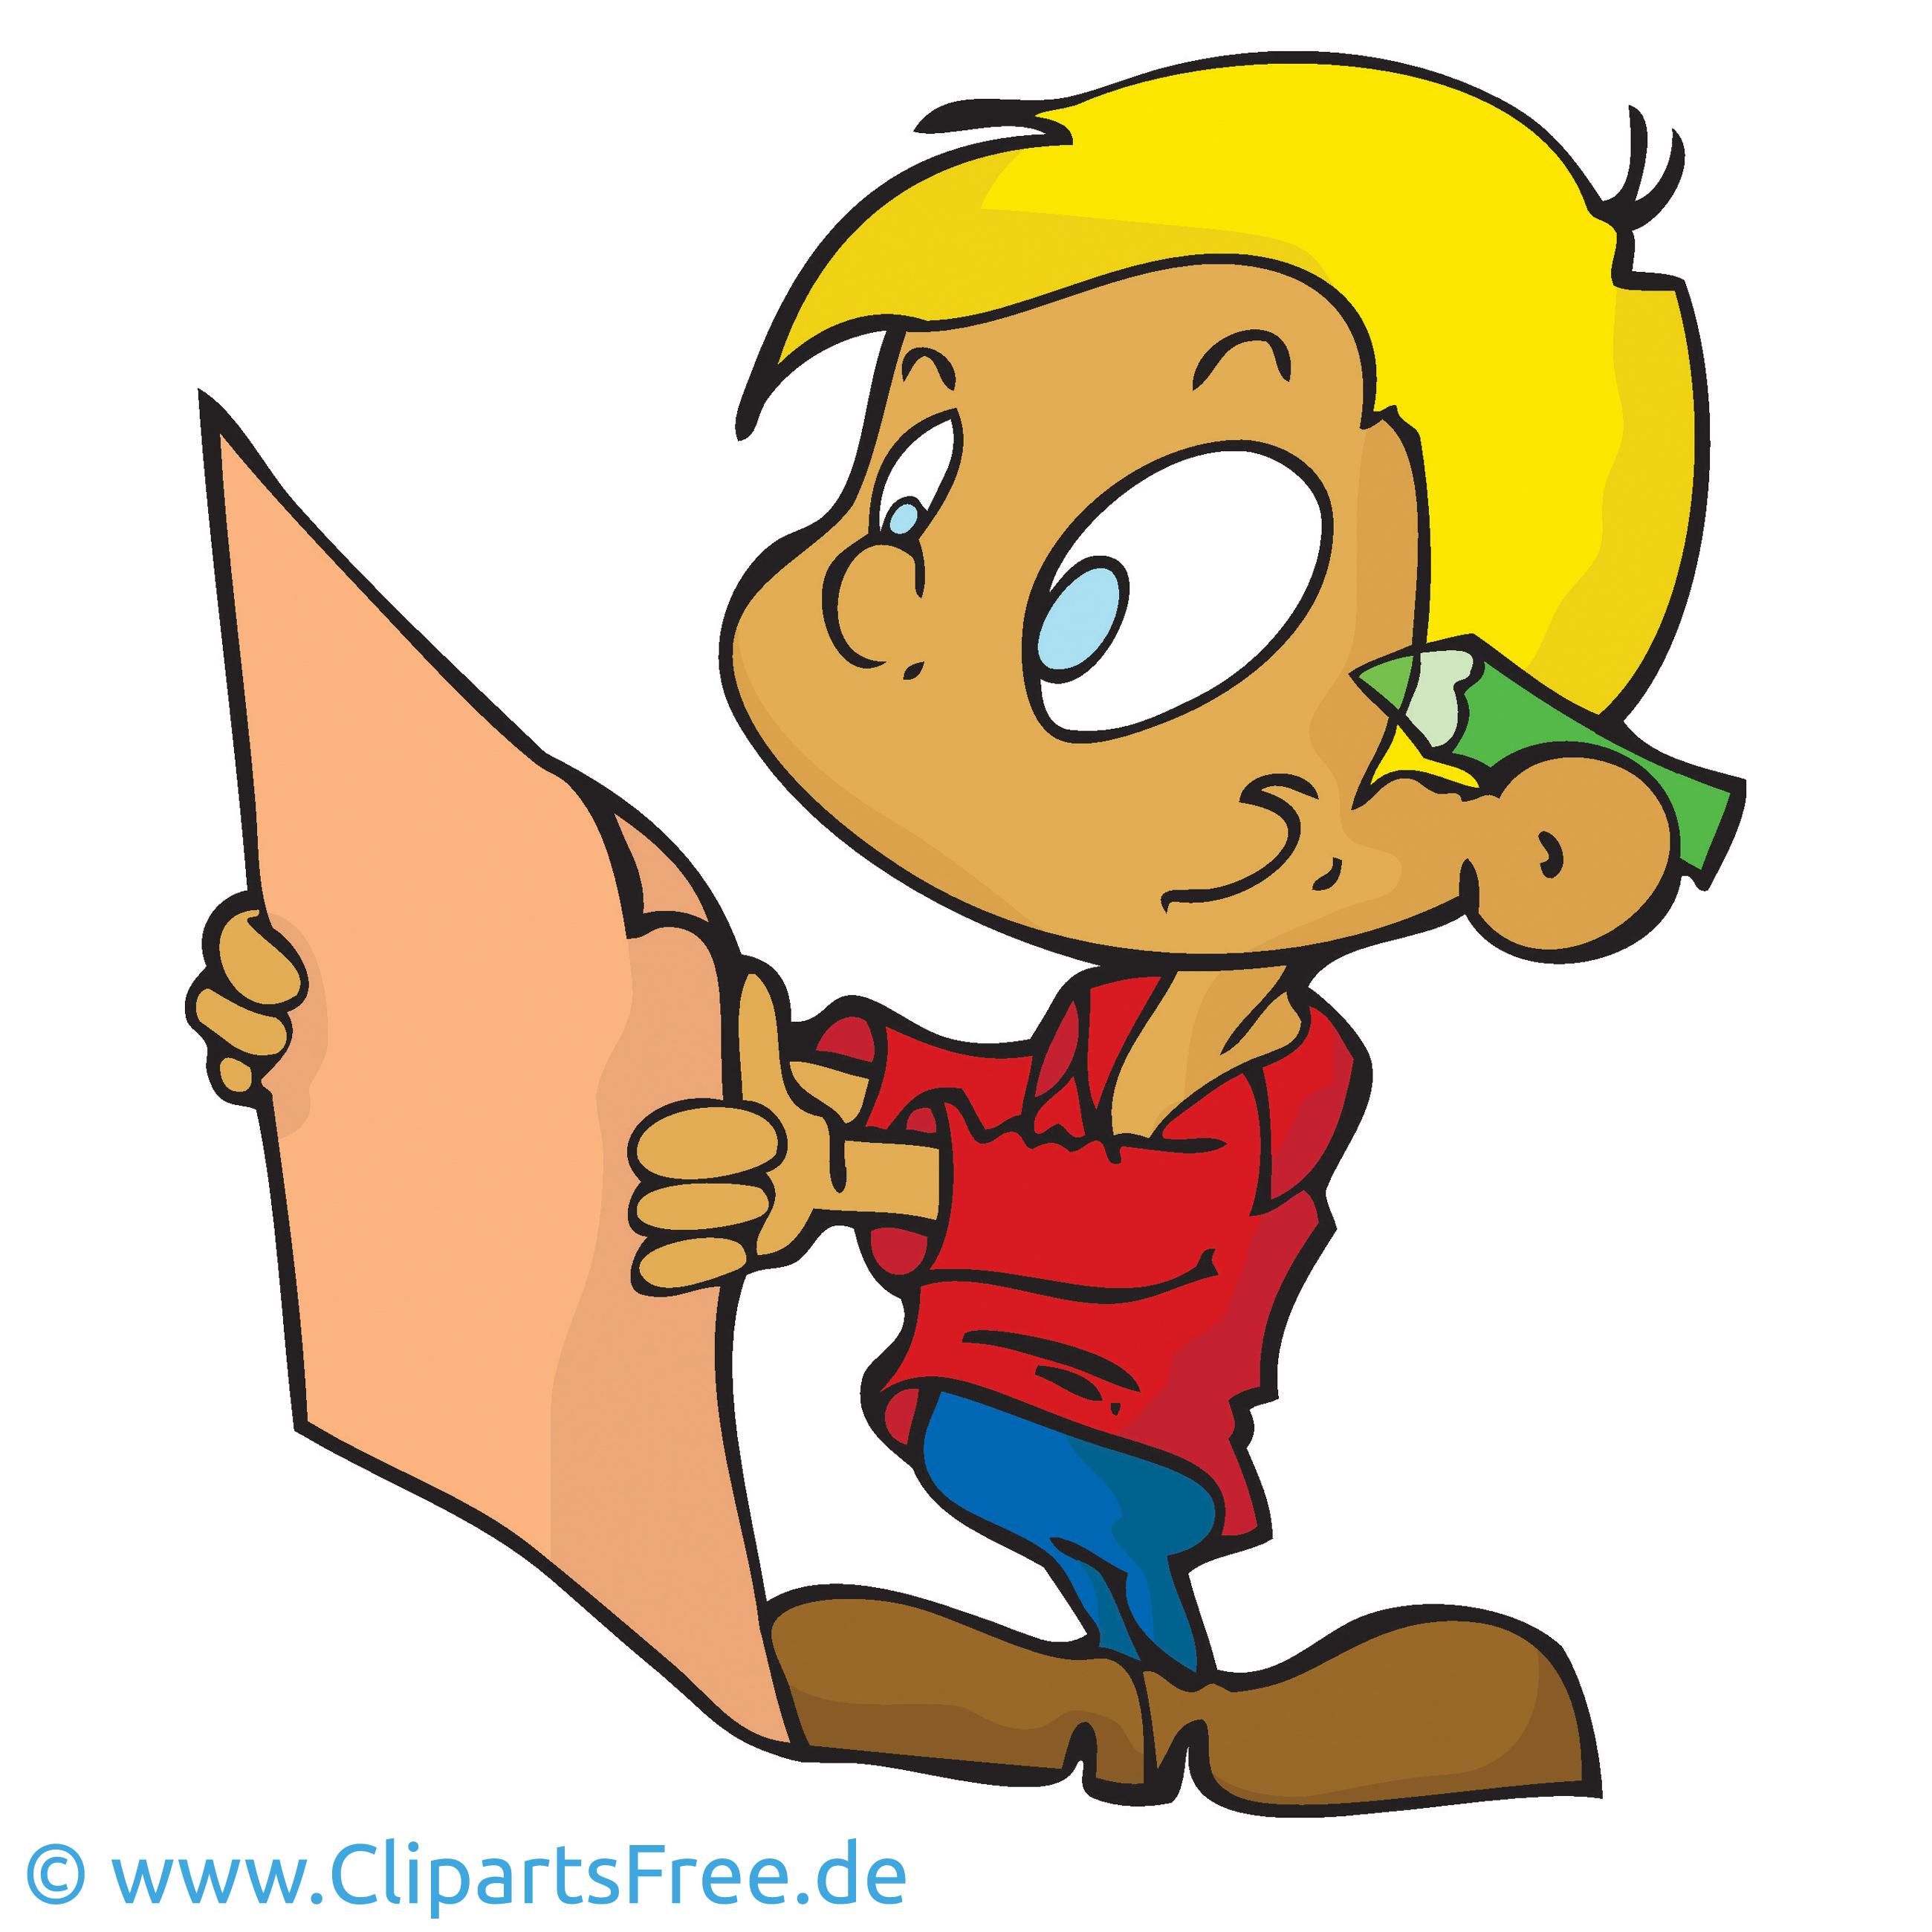 Kinder in der schule clipart clip art freeuse library Schule clipart kostenlos - ClipartFest clip art freeuse library